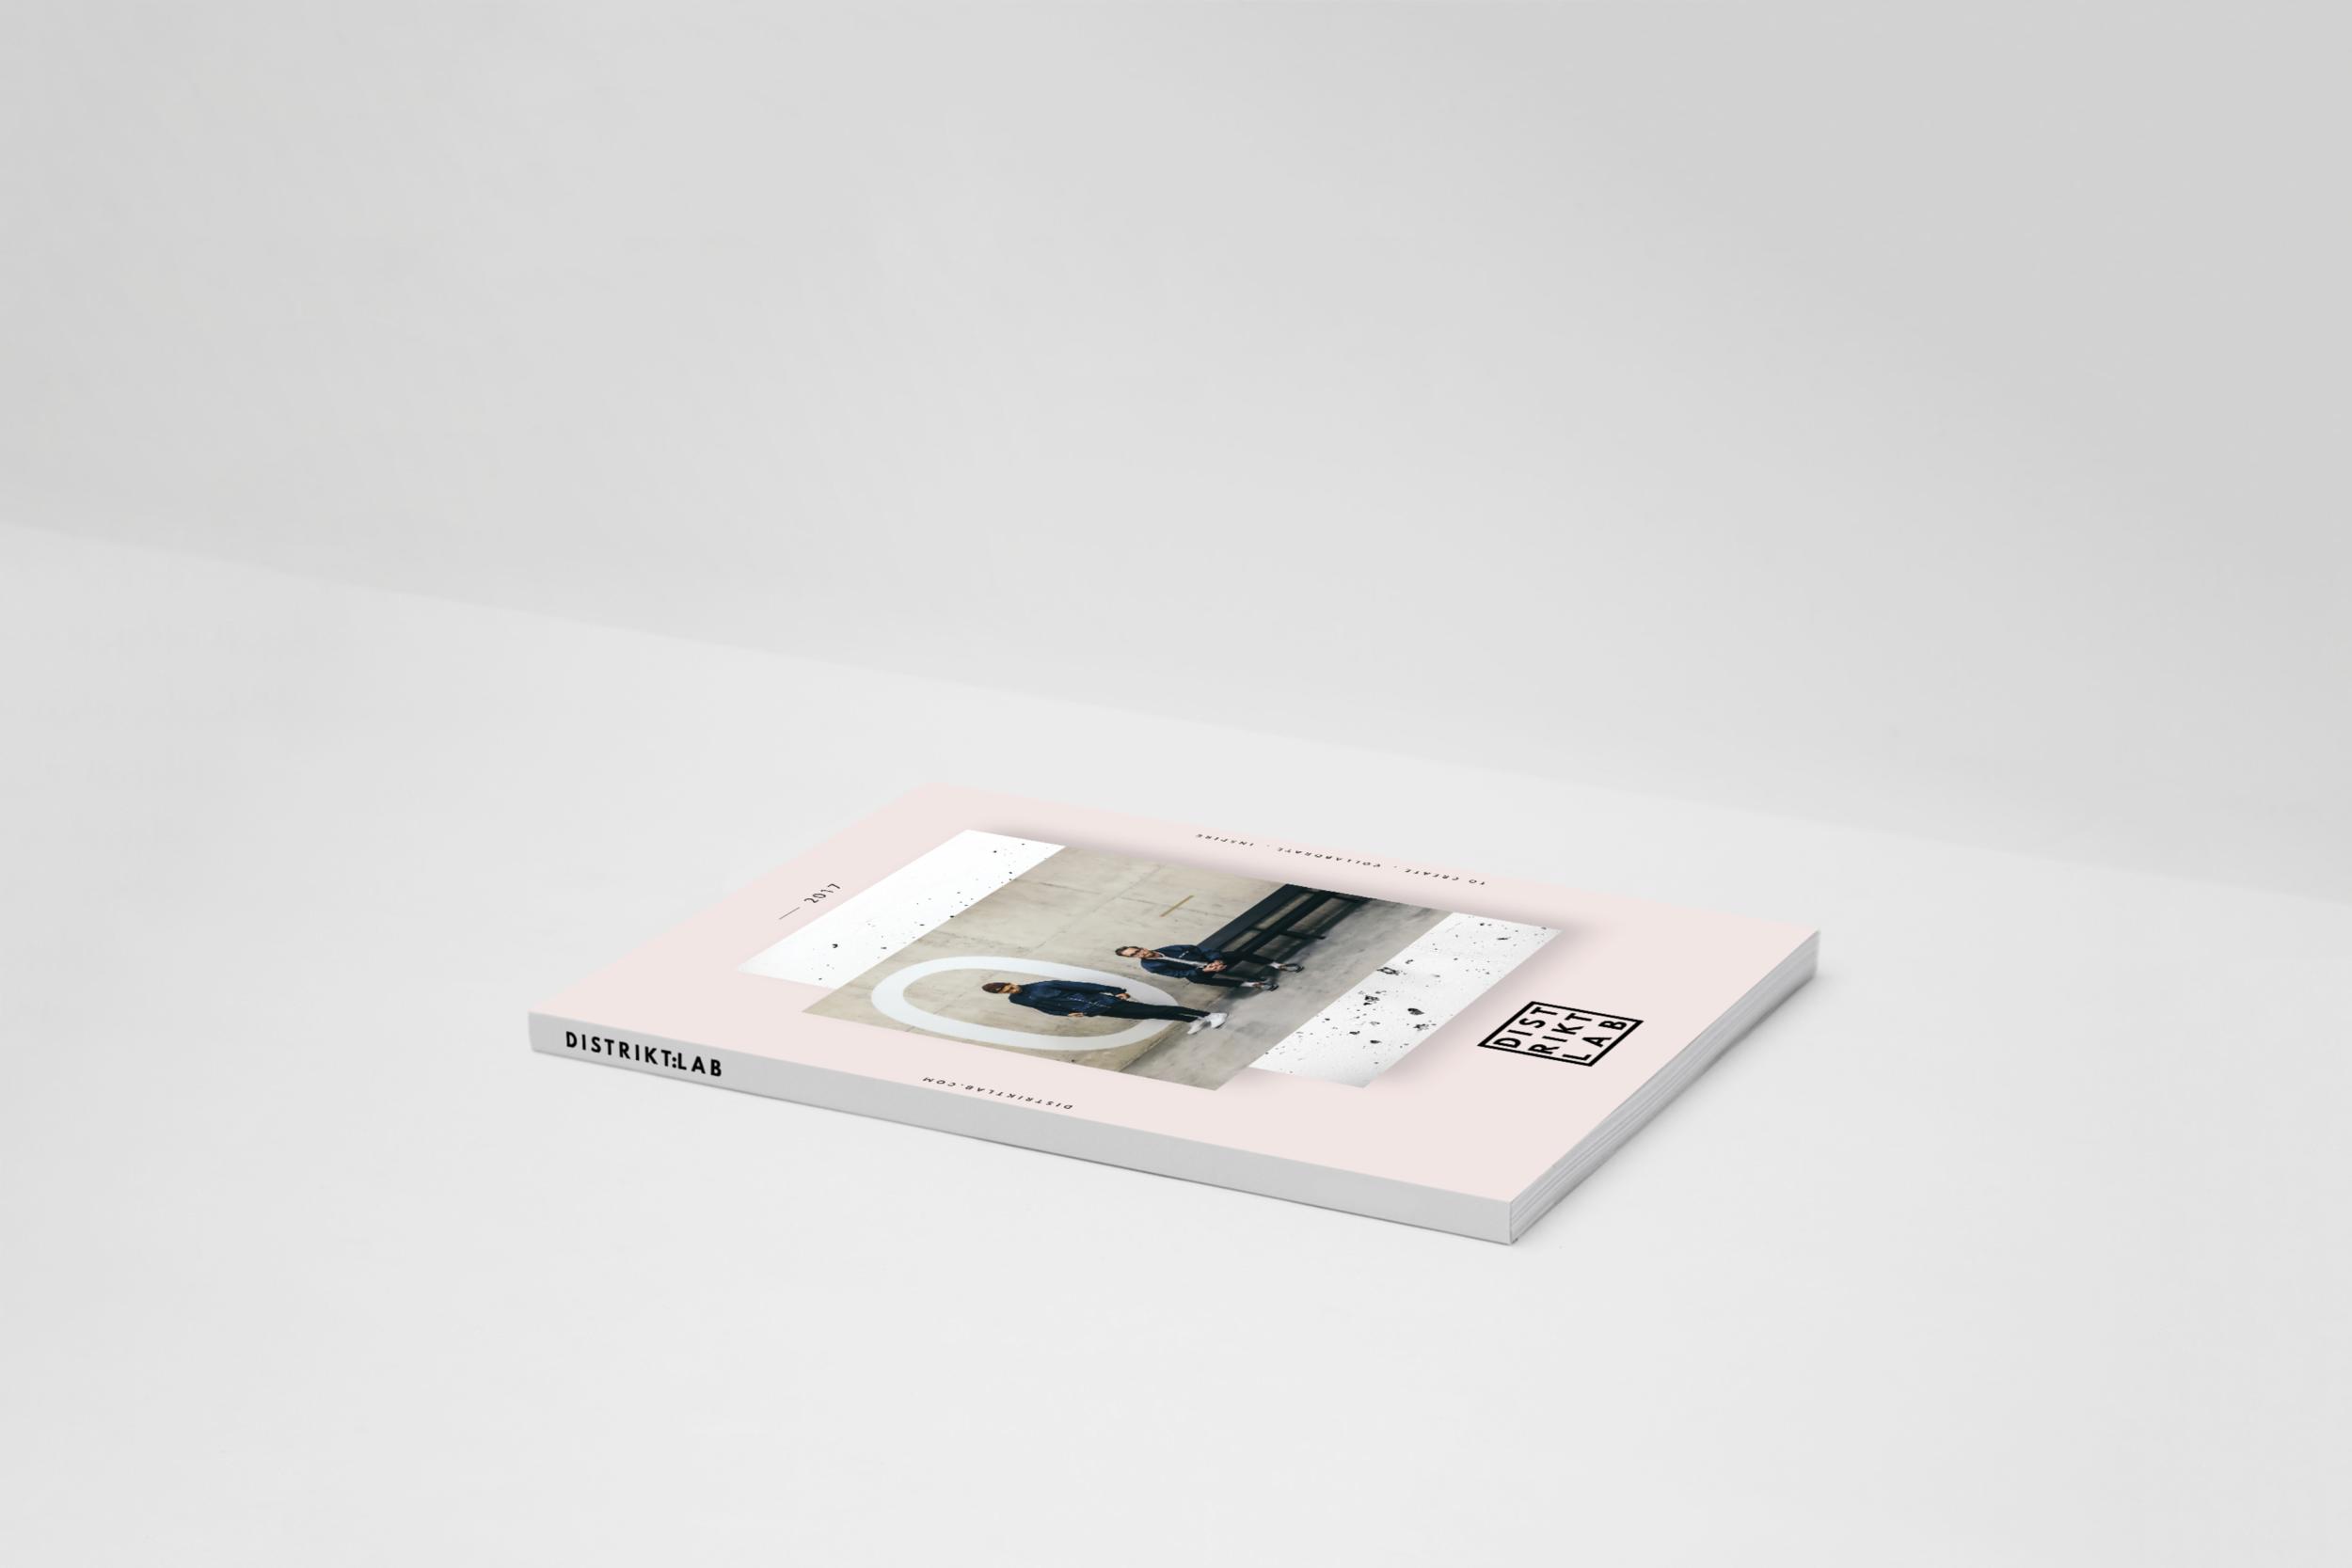 distrikt-book.png